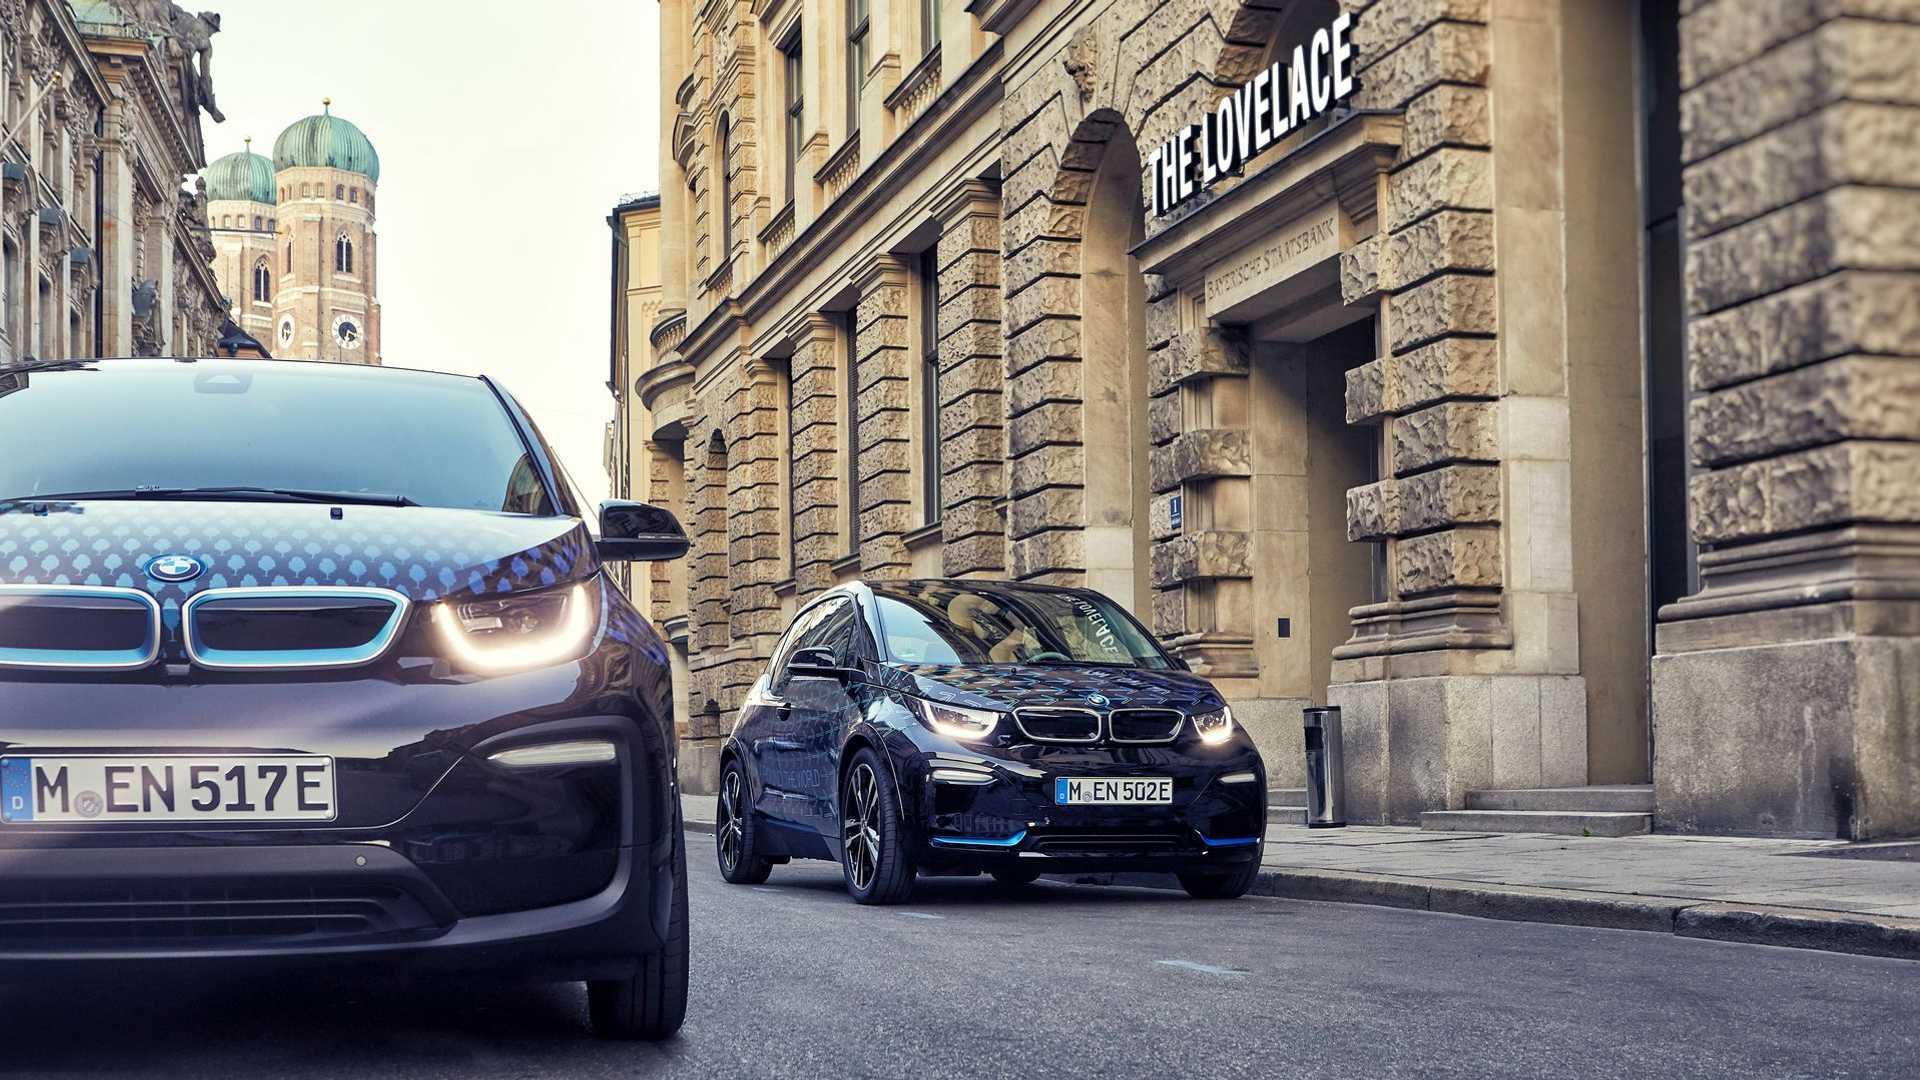 Продажи BMW i3 в США снизились на 85% во втором квартале 2020 года